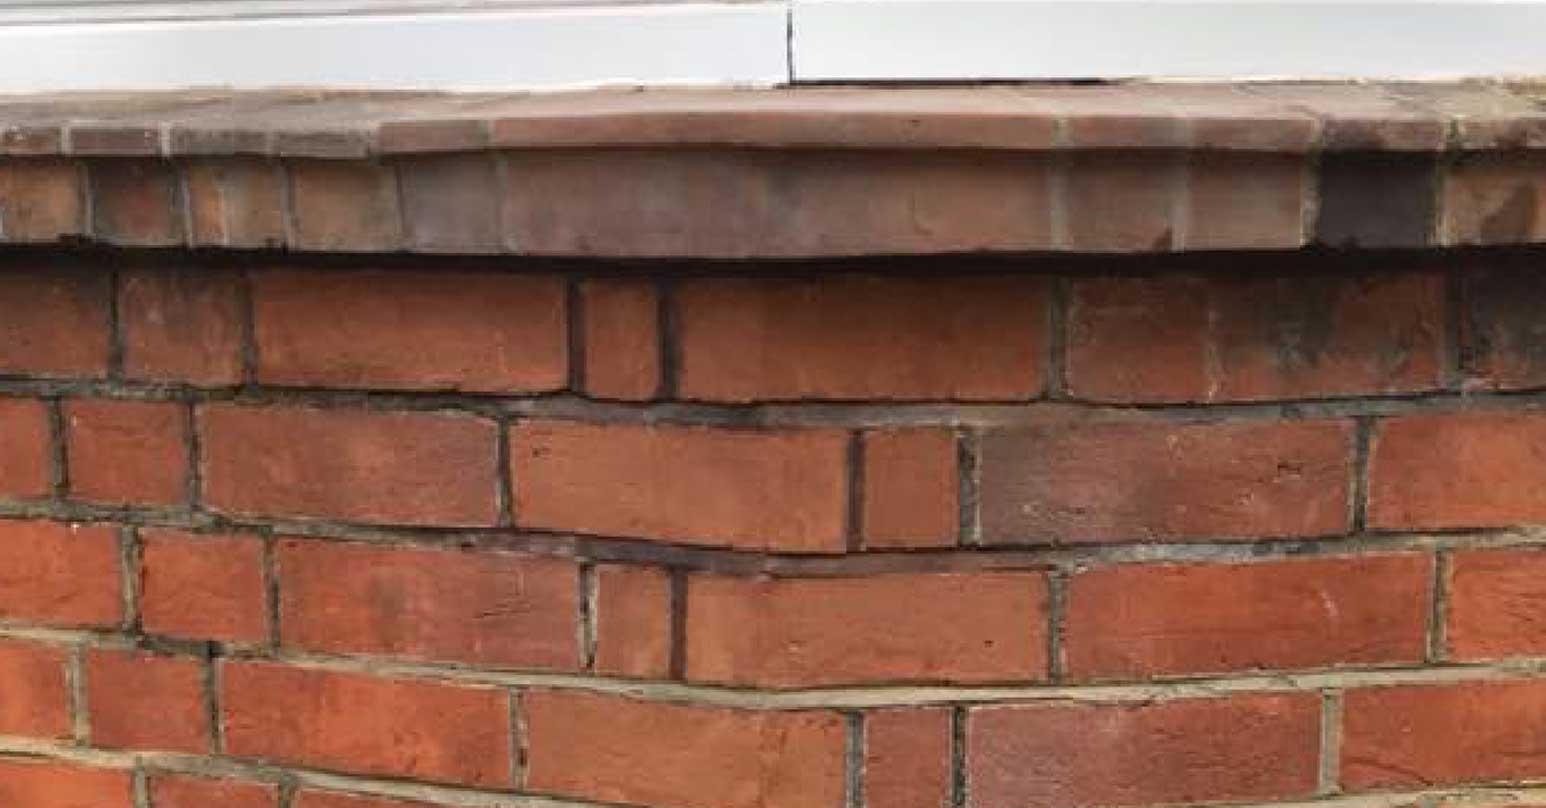 Damaged brick - After repair